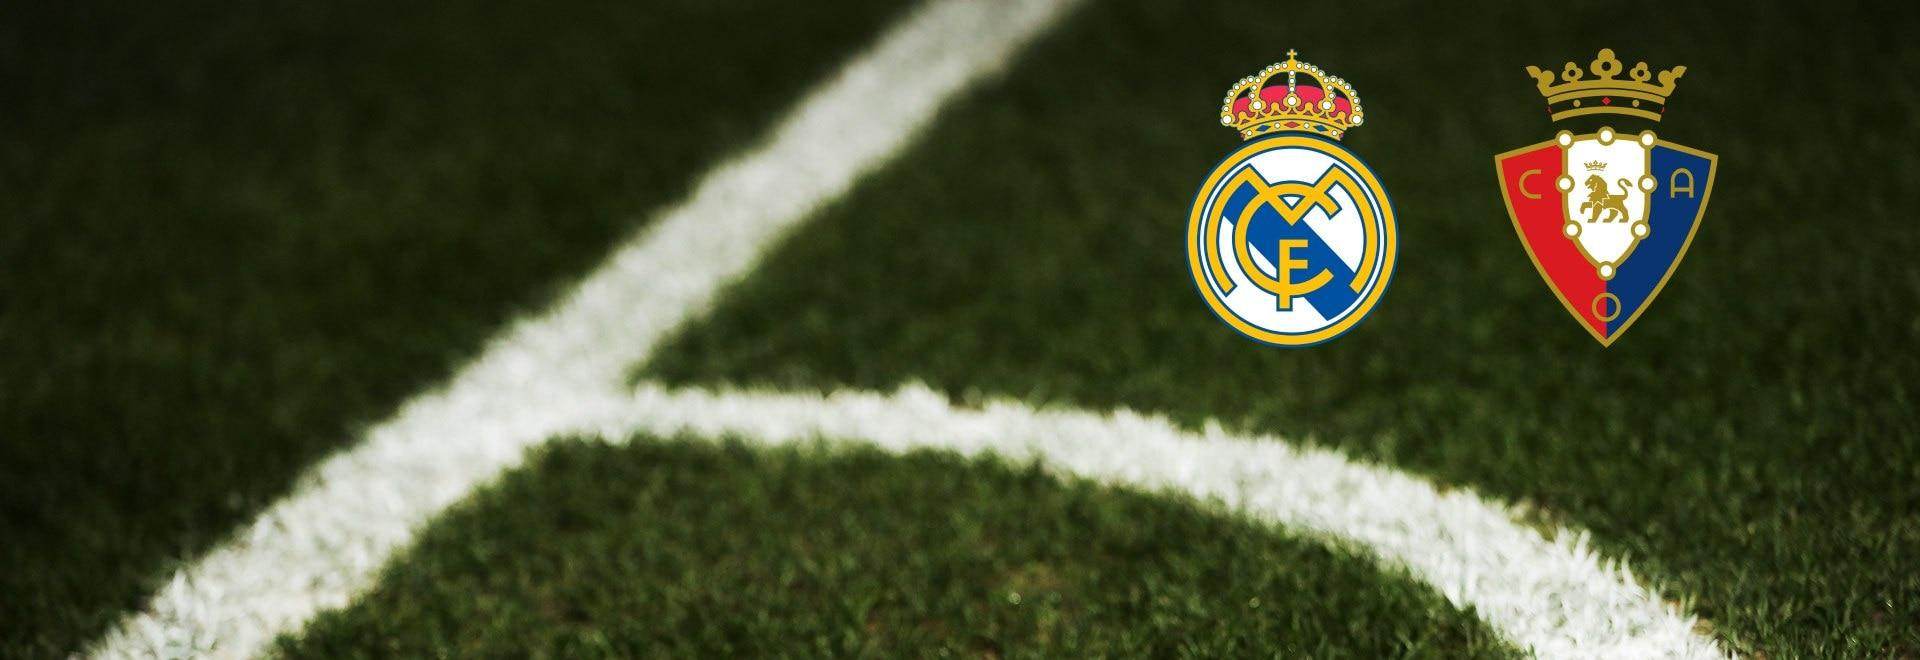 Real Madrid - Osasuna. 34a g.